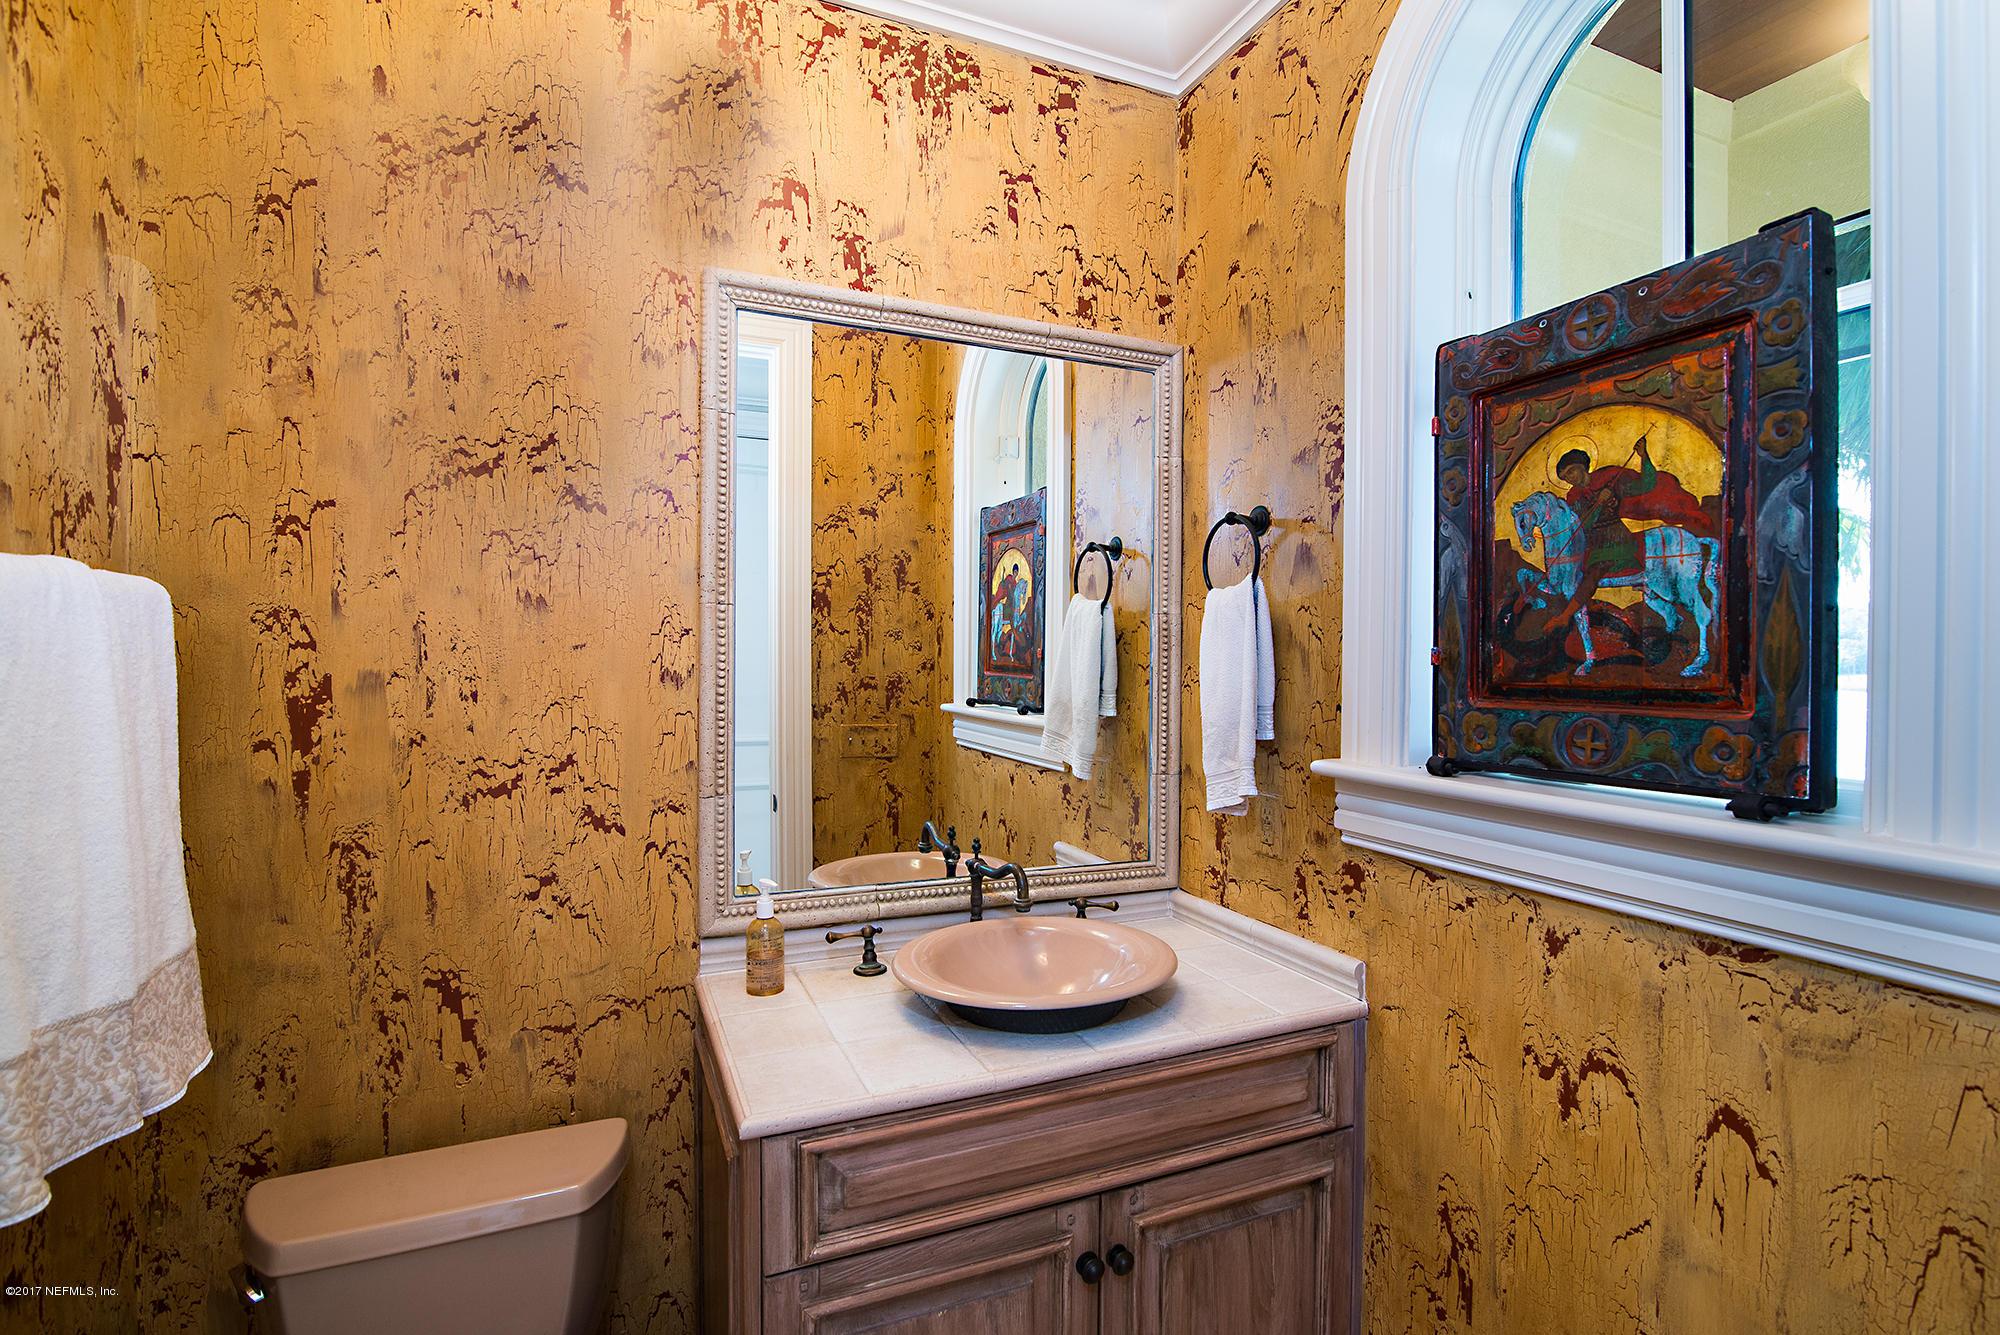 121 BRISTOL, PONTE VEDRA BEACH, FLORIDA 32082, 5 Bedrooms Bedrooms, ,7 BathroomsBathrooms,Residential - single family,For sale,BRISTOL,912388